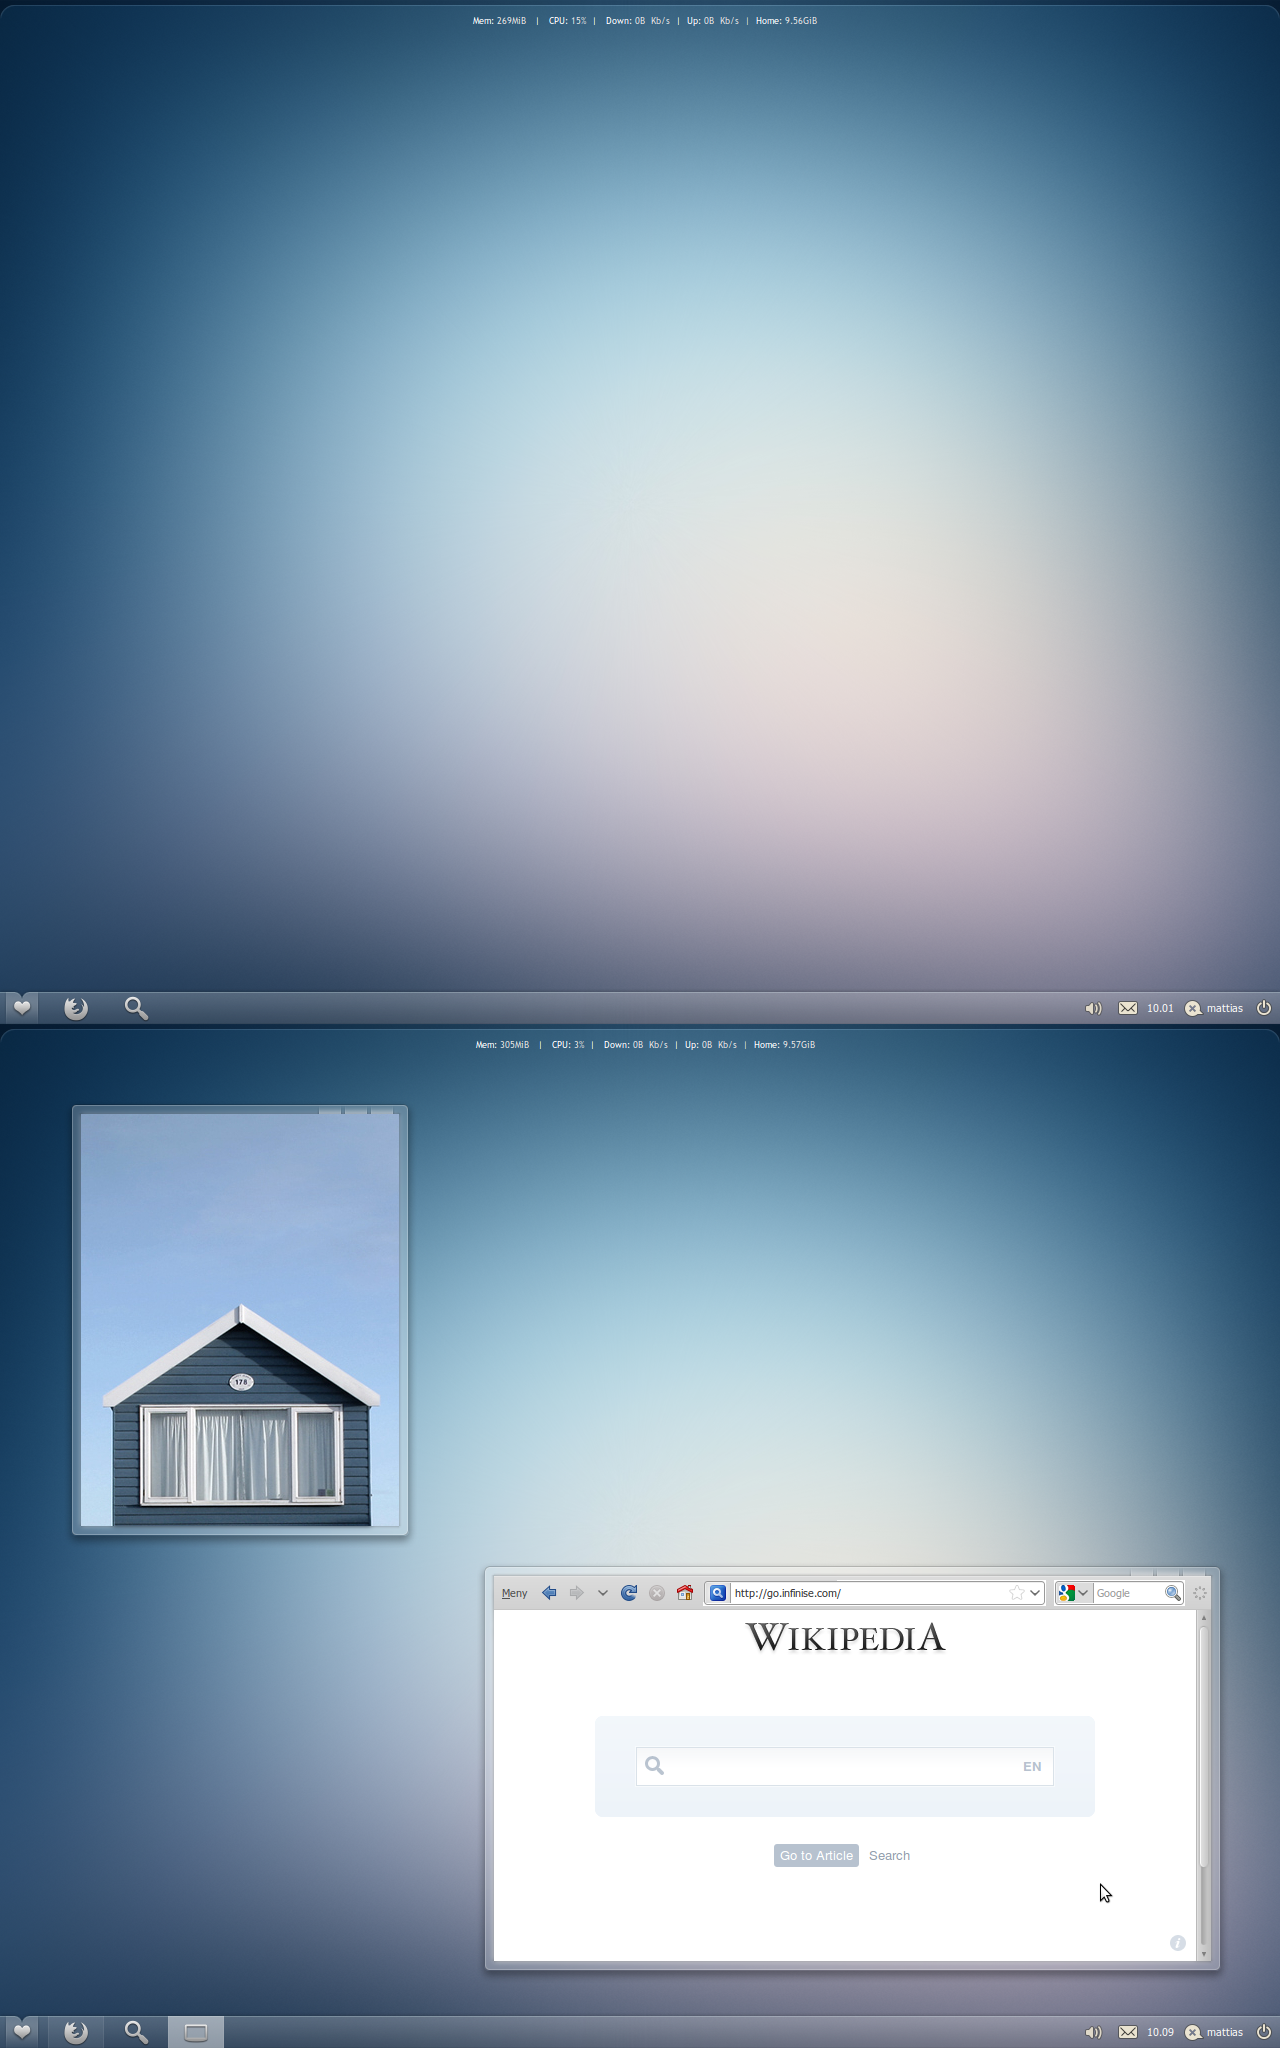 Ubuntu May 2010 Screenshot by lassekongo83